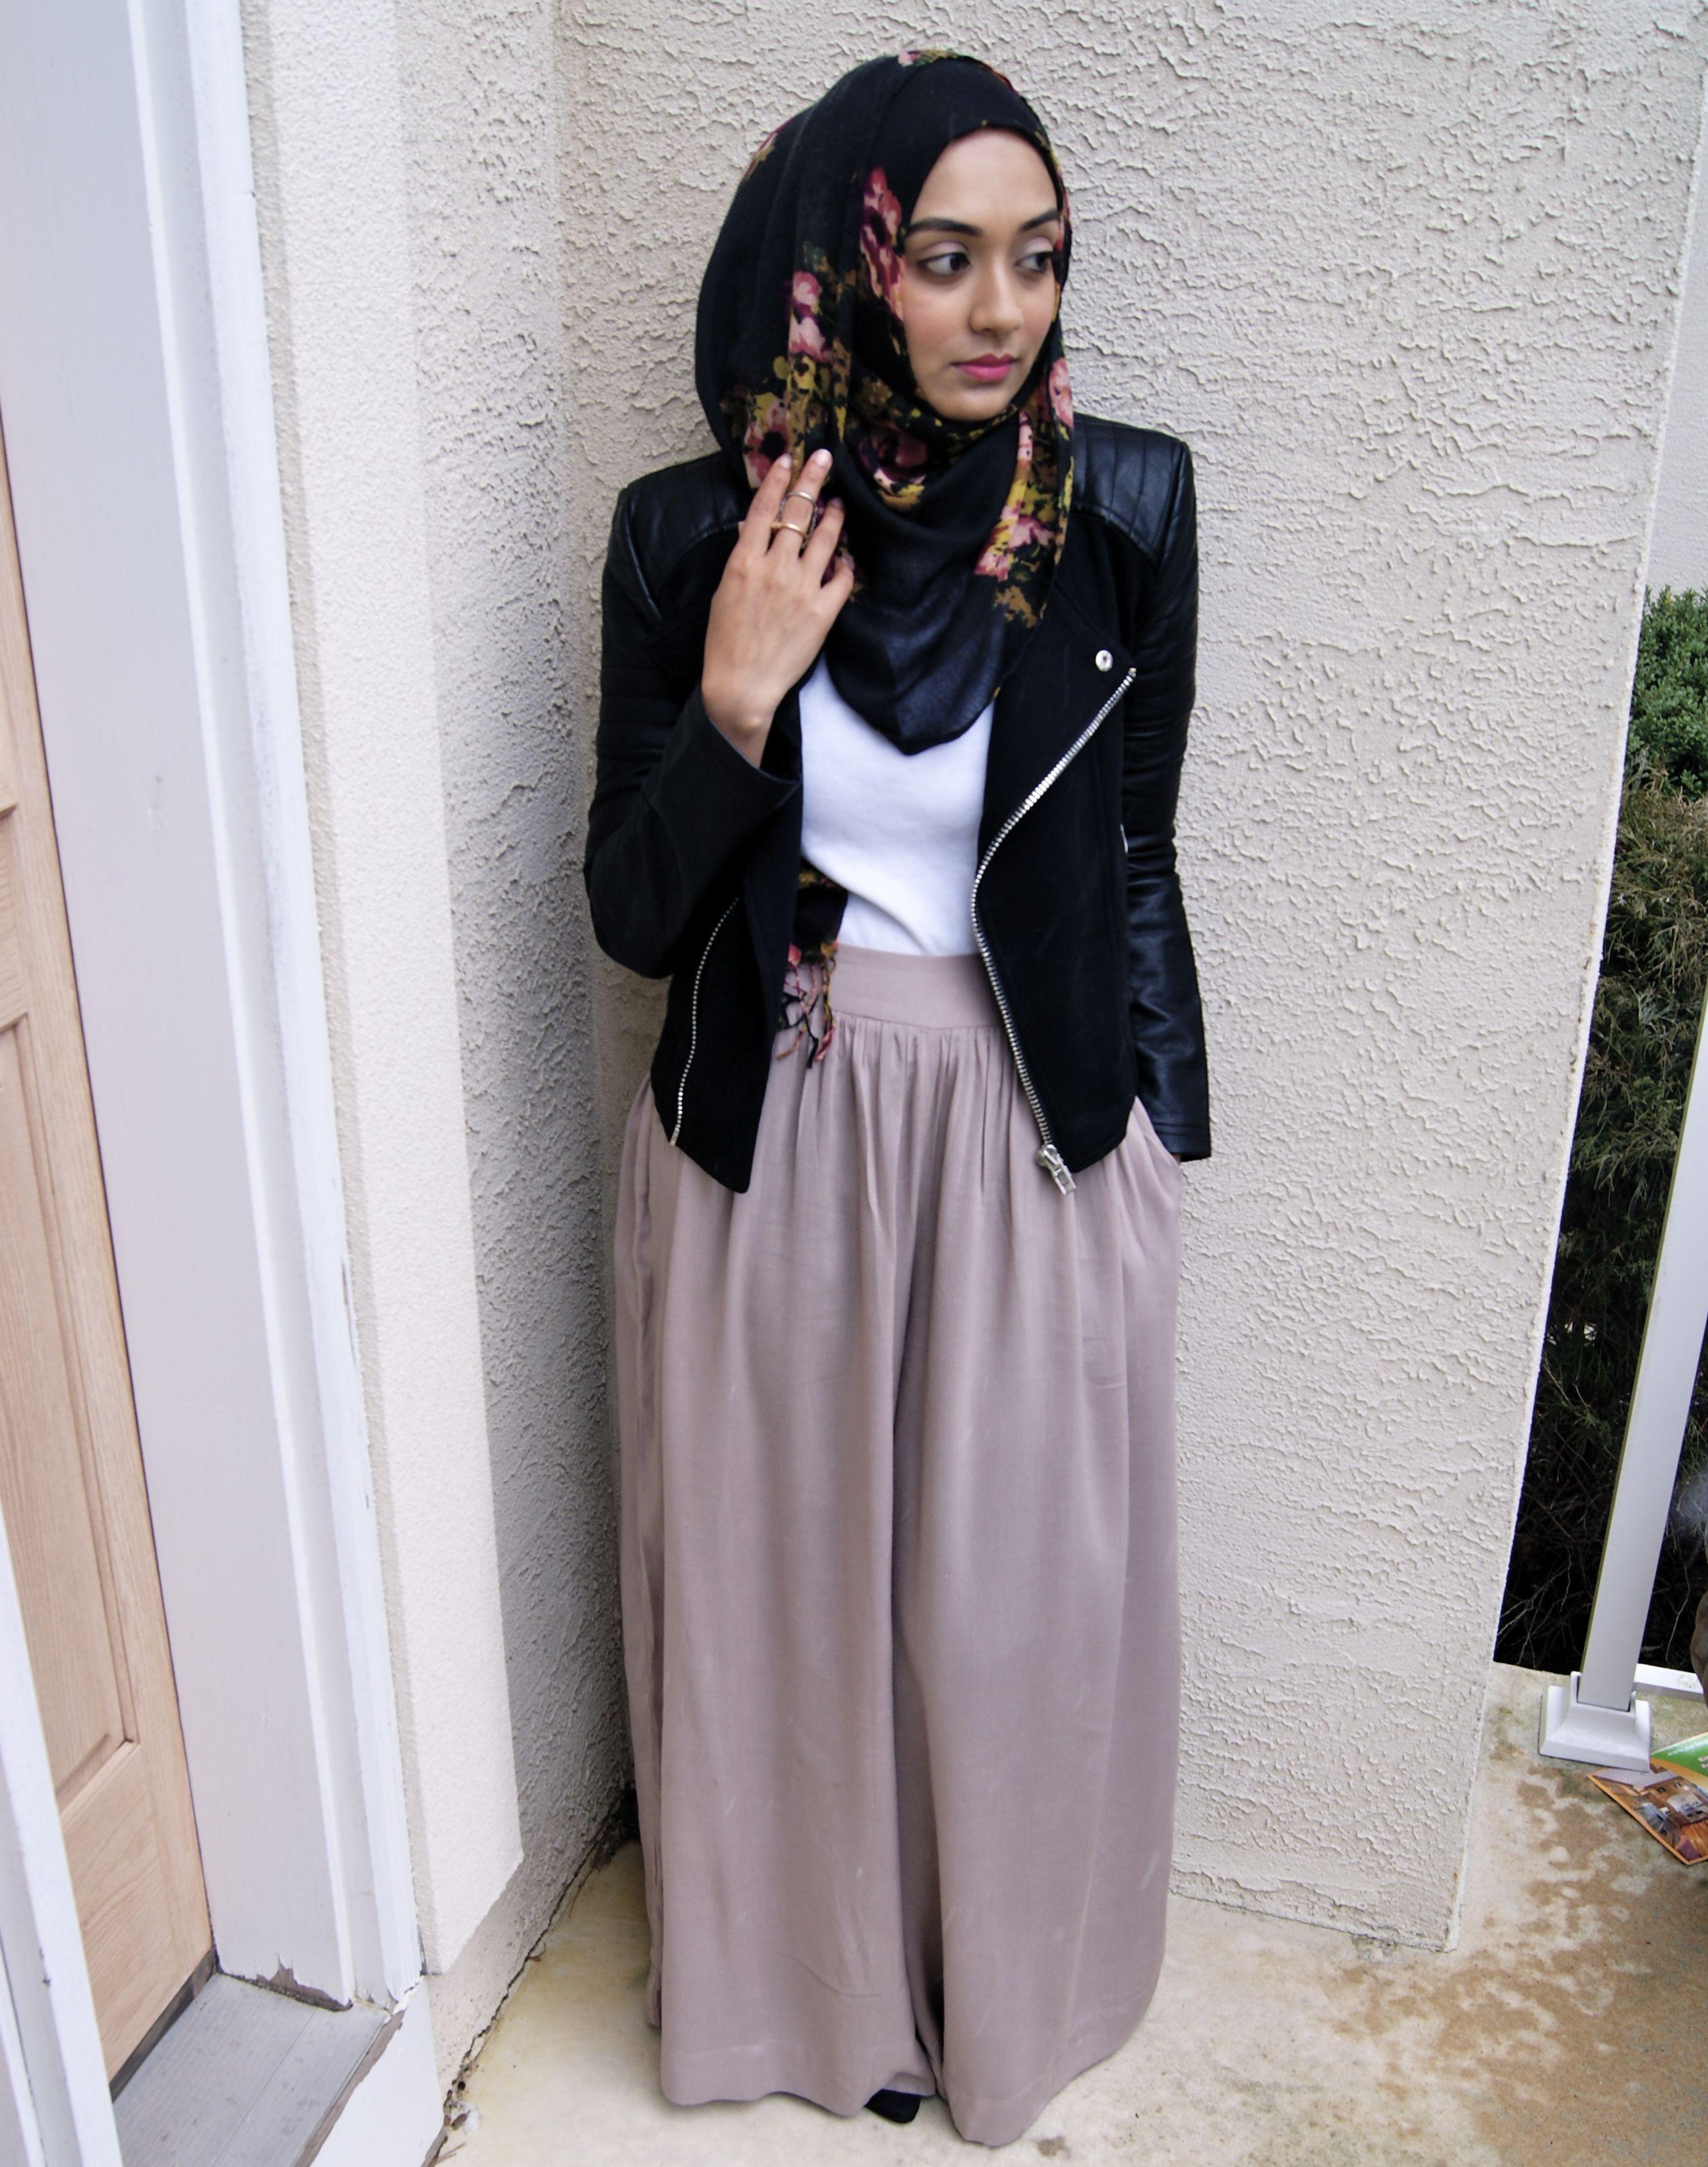 Leather jacket hijab - What To Wear Summer Edition Muslimgirl Netmuslimgirl Net Hijab Fashionmodest Fashionbeautiful Hijabblack Leather Jacketspalazzo